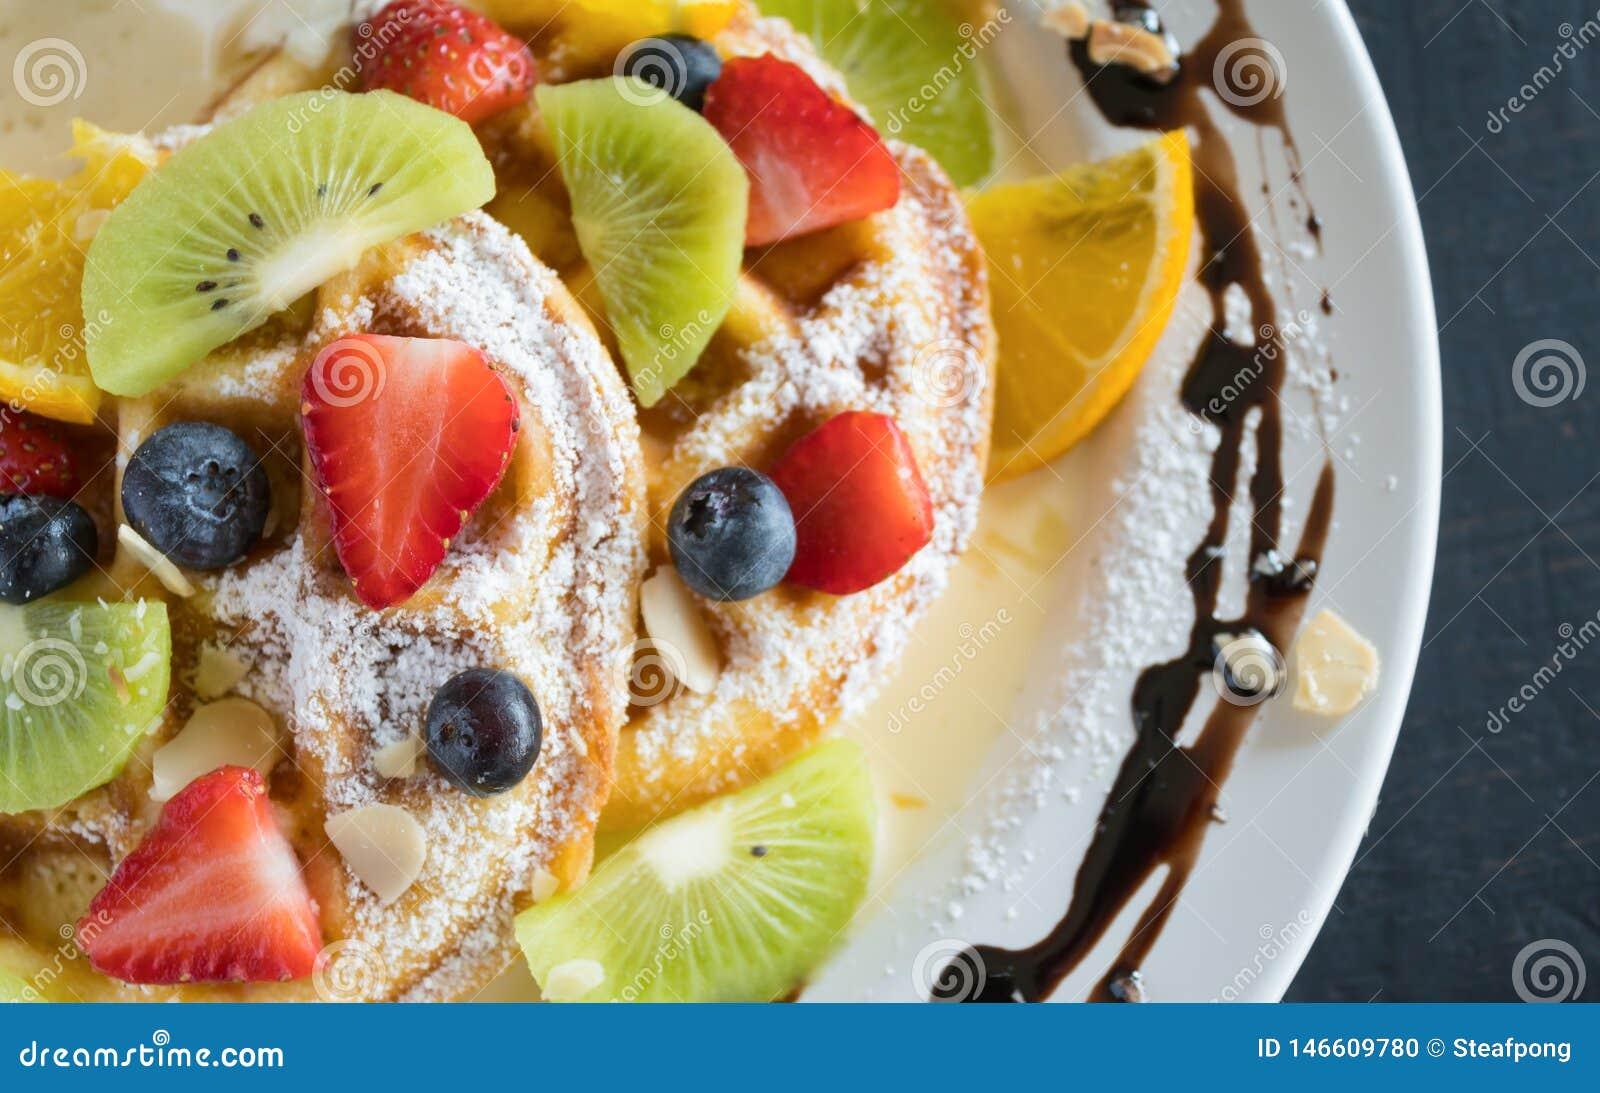 Mirtilo Kiwi Lemon Waffle Chocolate Dessert 3 da morango de Flatlay meio